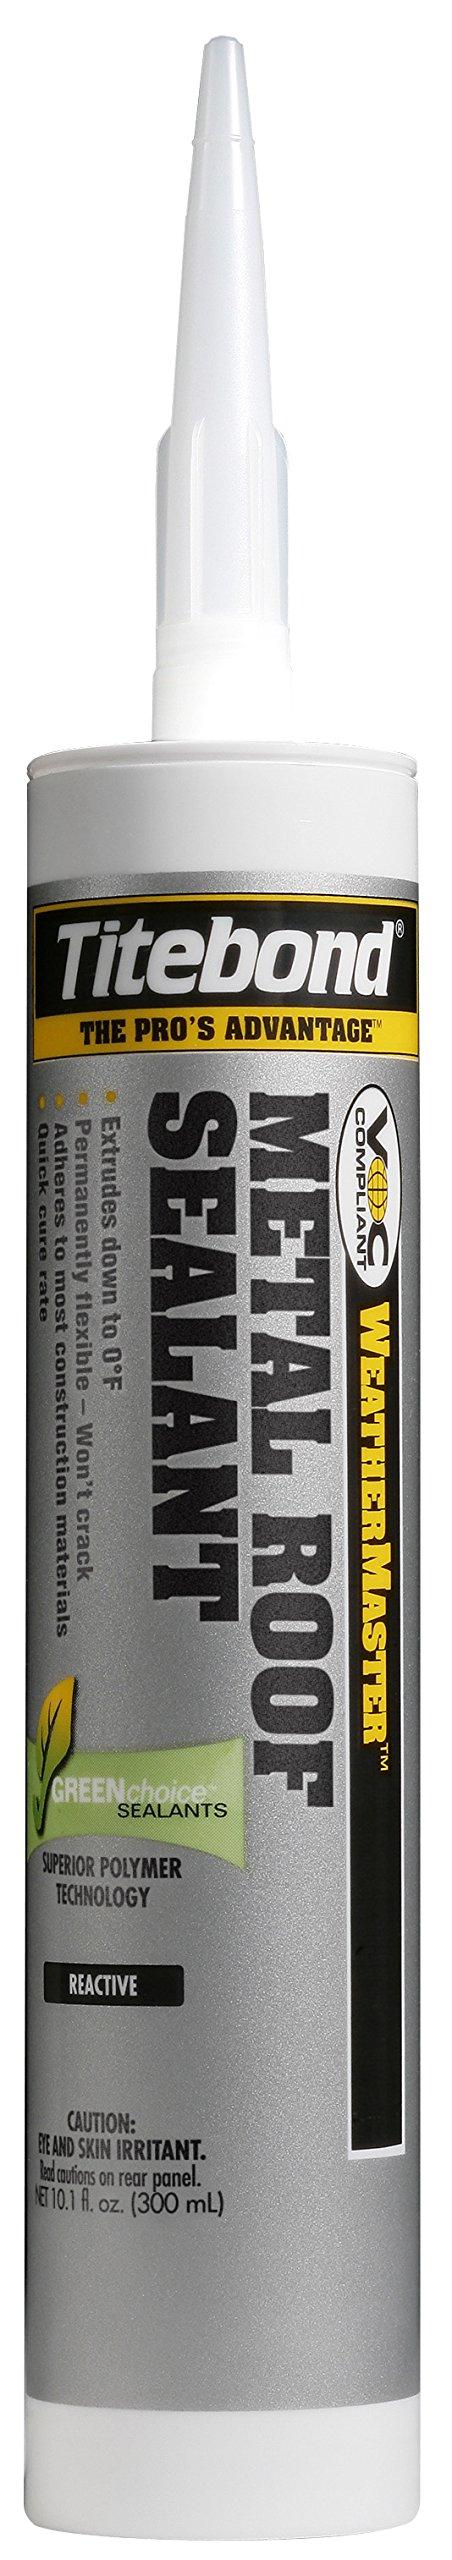 Titebond 61341 Metal Roof Sealant Cartridge, 10.1 oz., Bronze